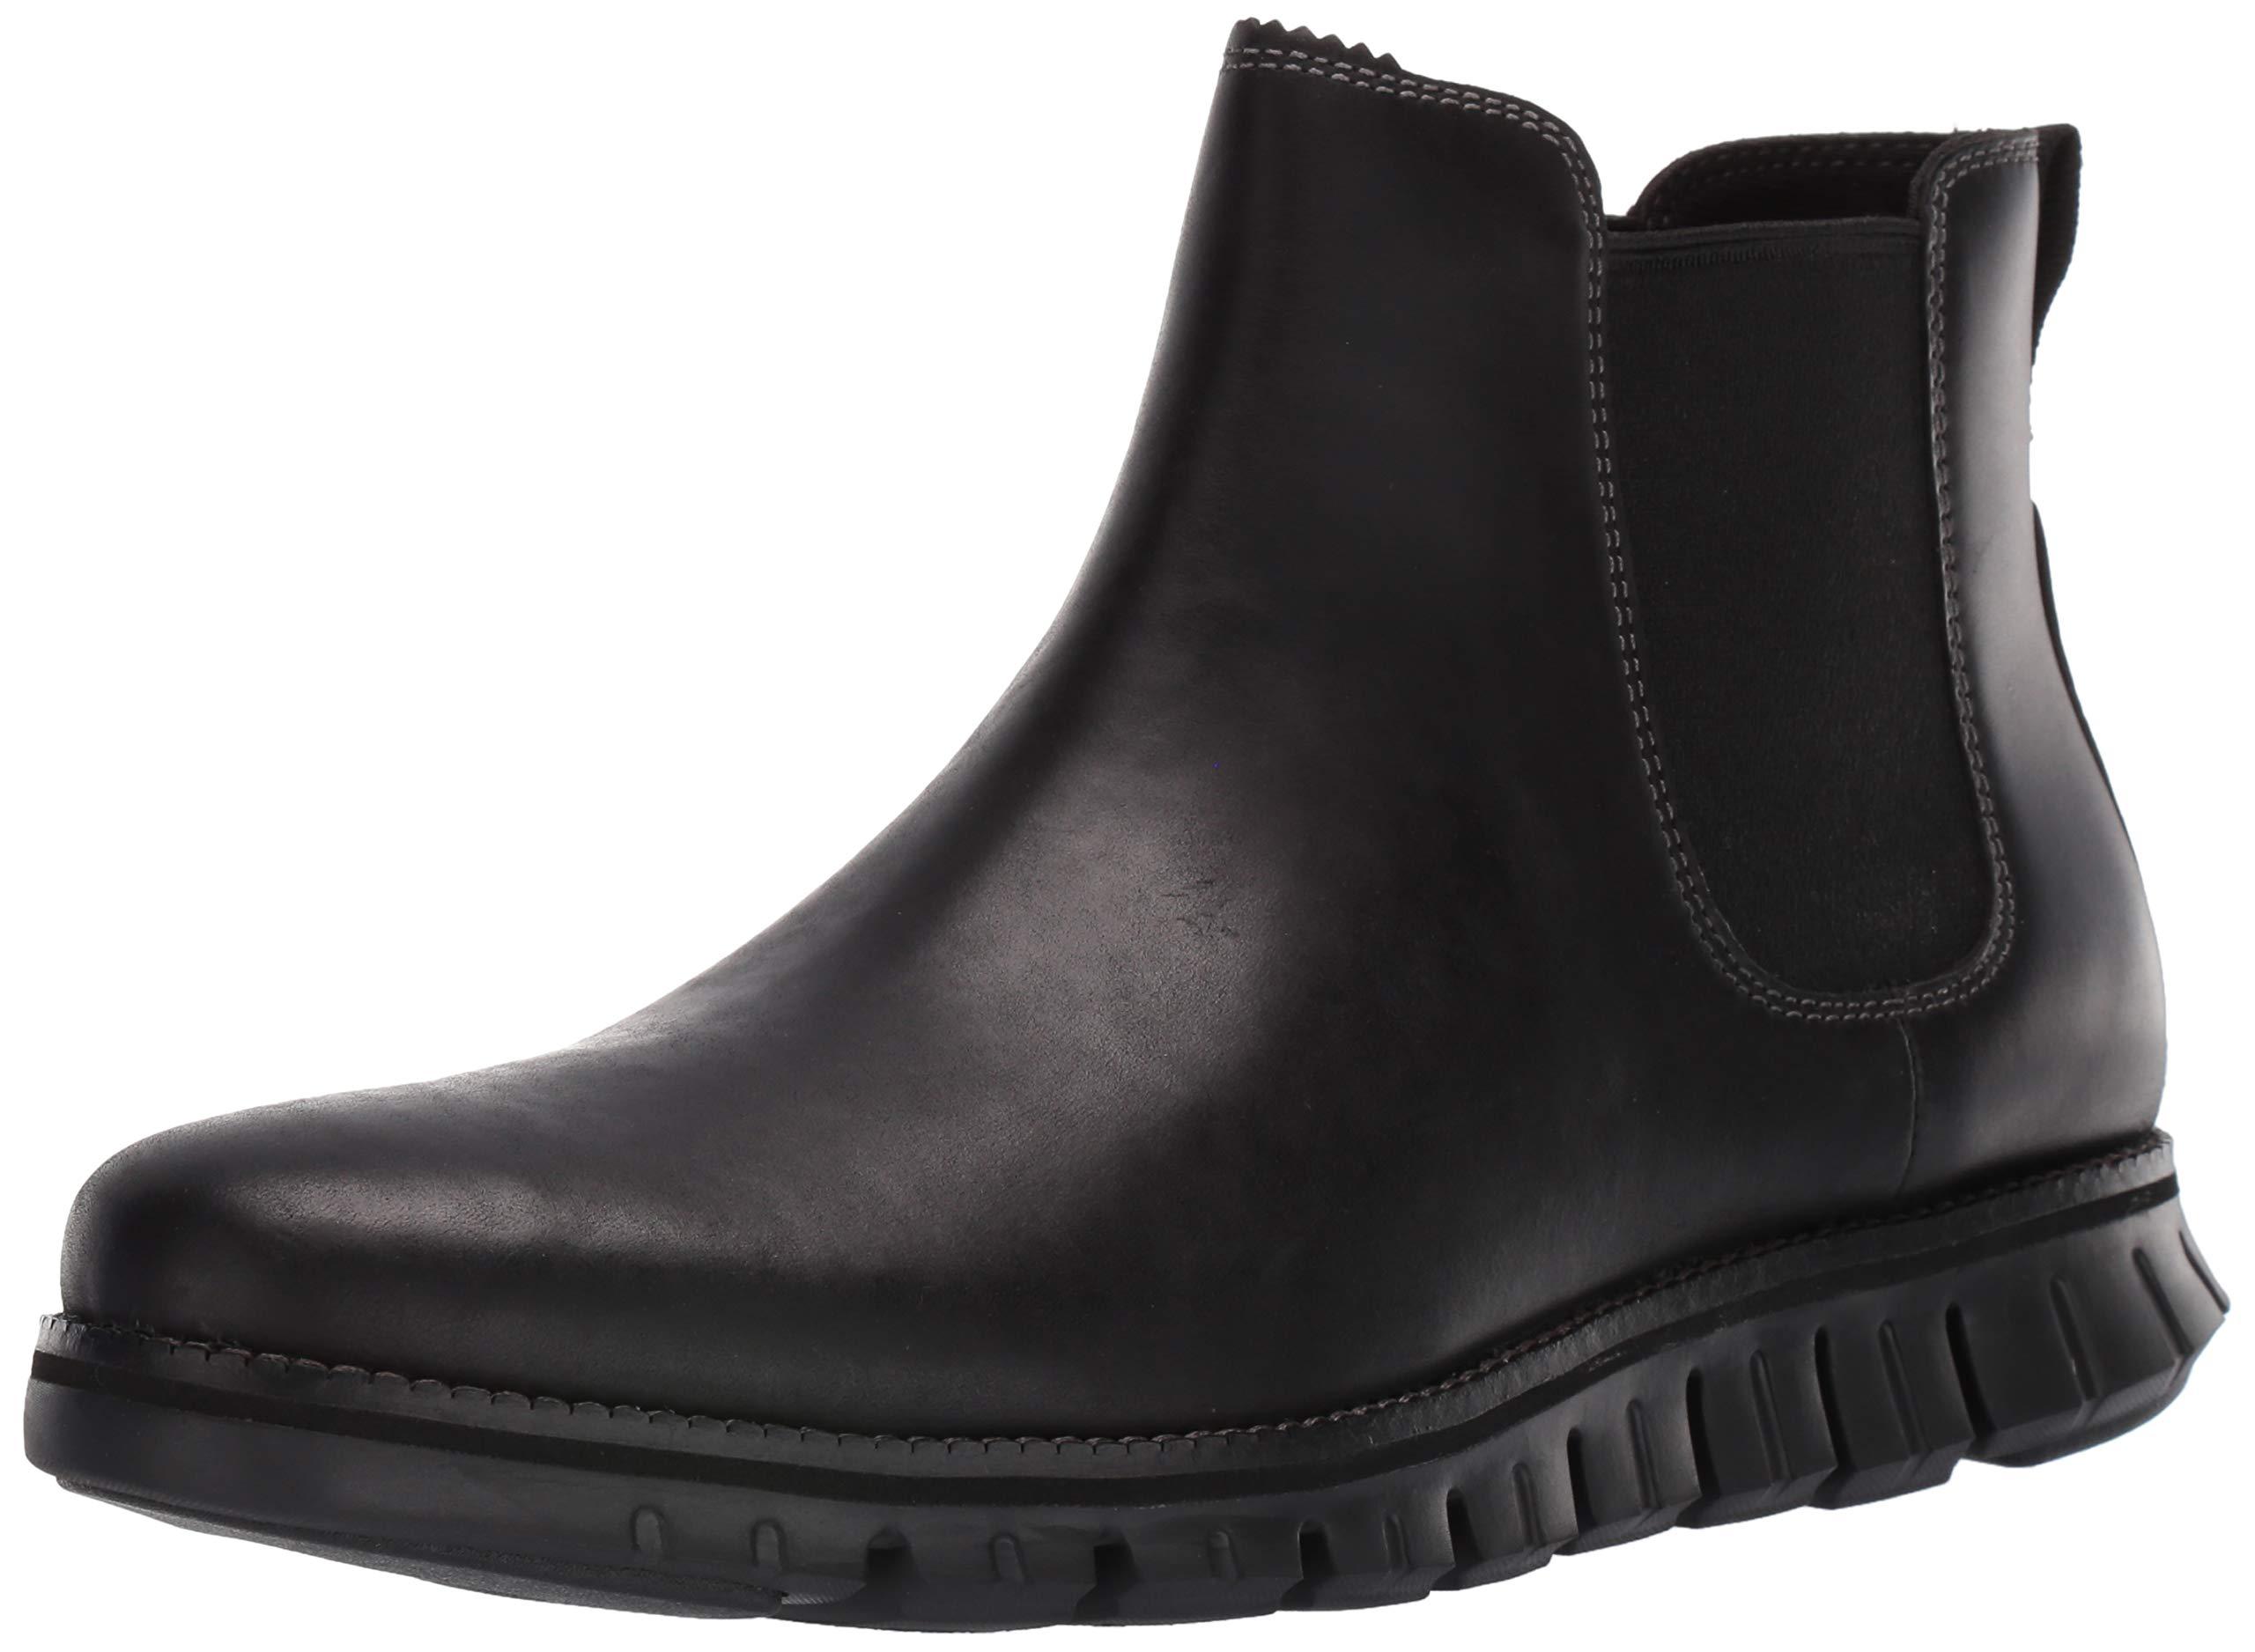 Cole Haan Men's Zerogrand Chelsea Waterproof Boot, Wp Black Leather, 10 M US by Cole Haan